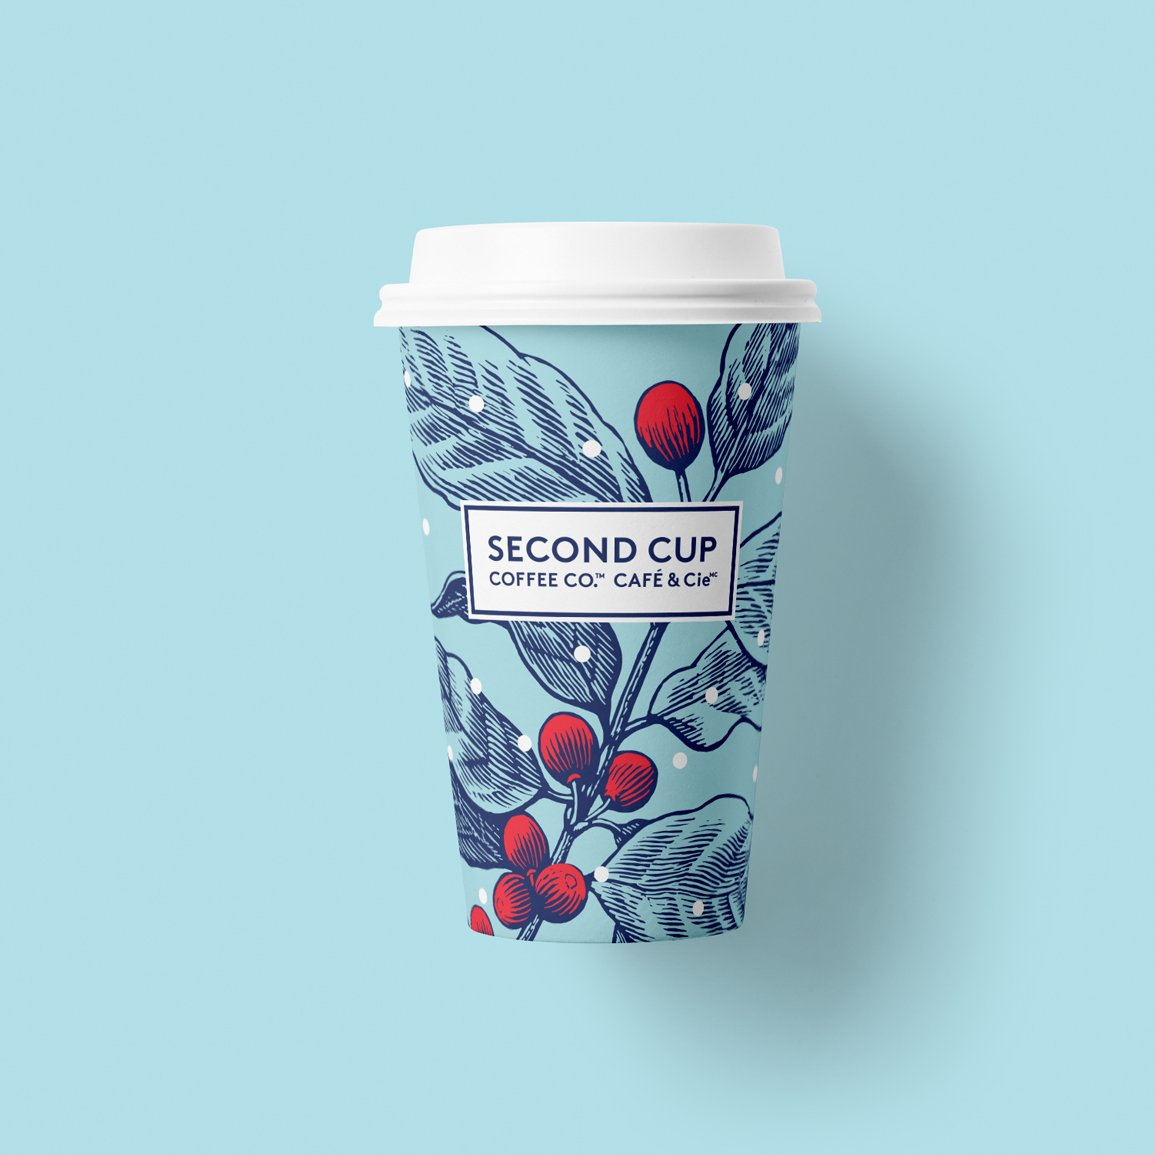 coffee campaign cup design